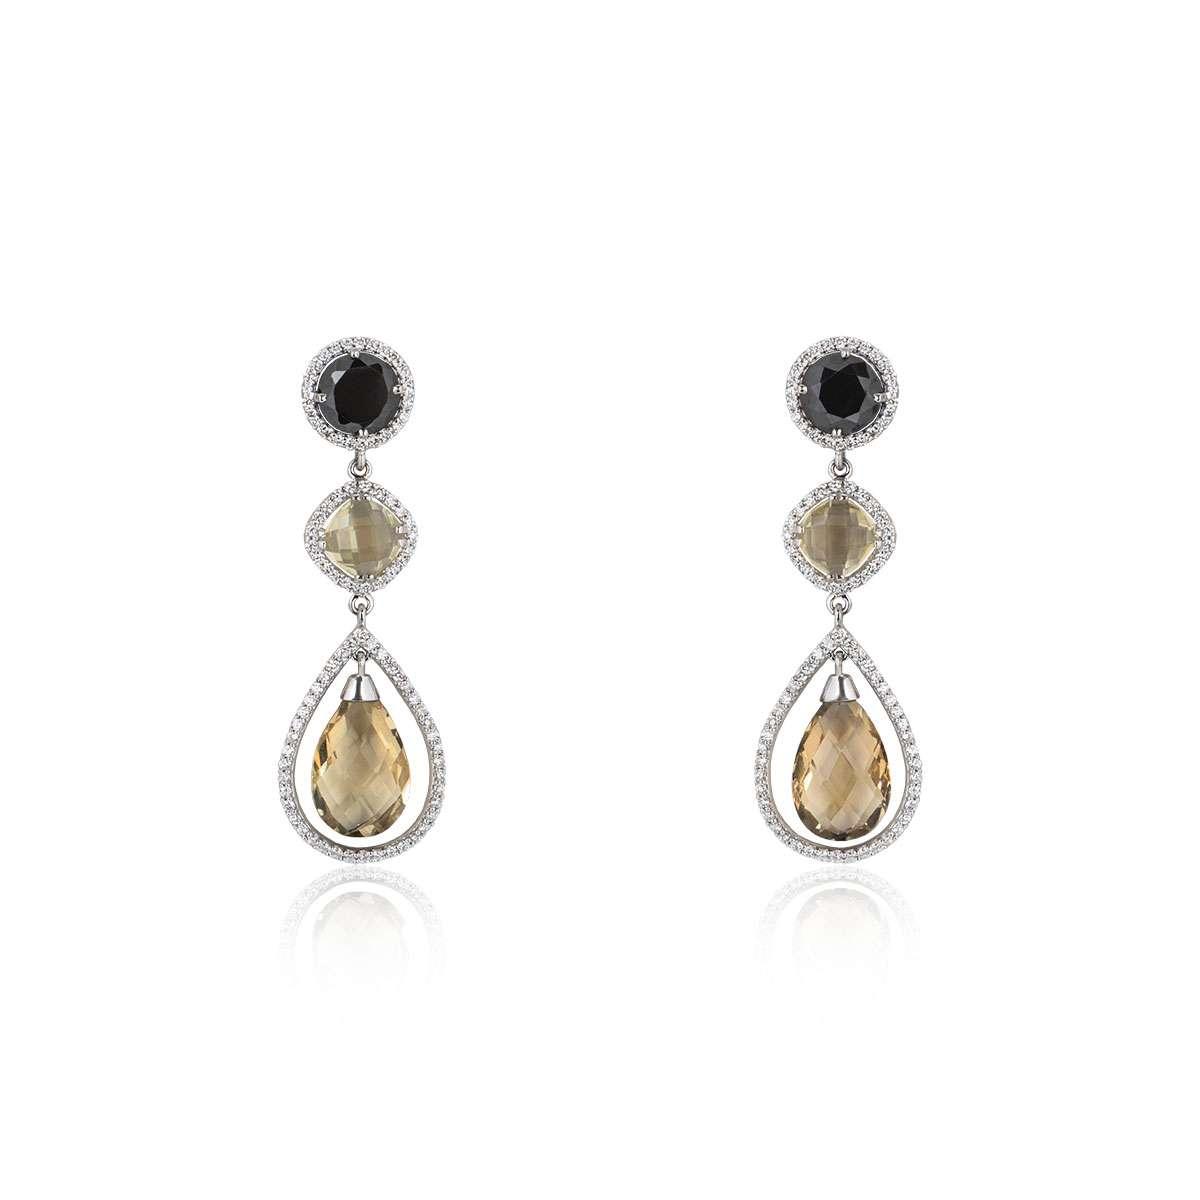 White Gold Diamond and Quartz Earrings